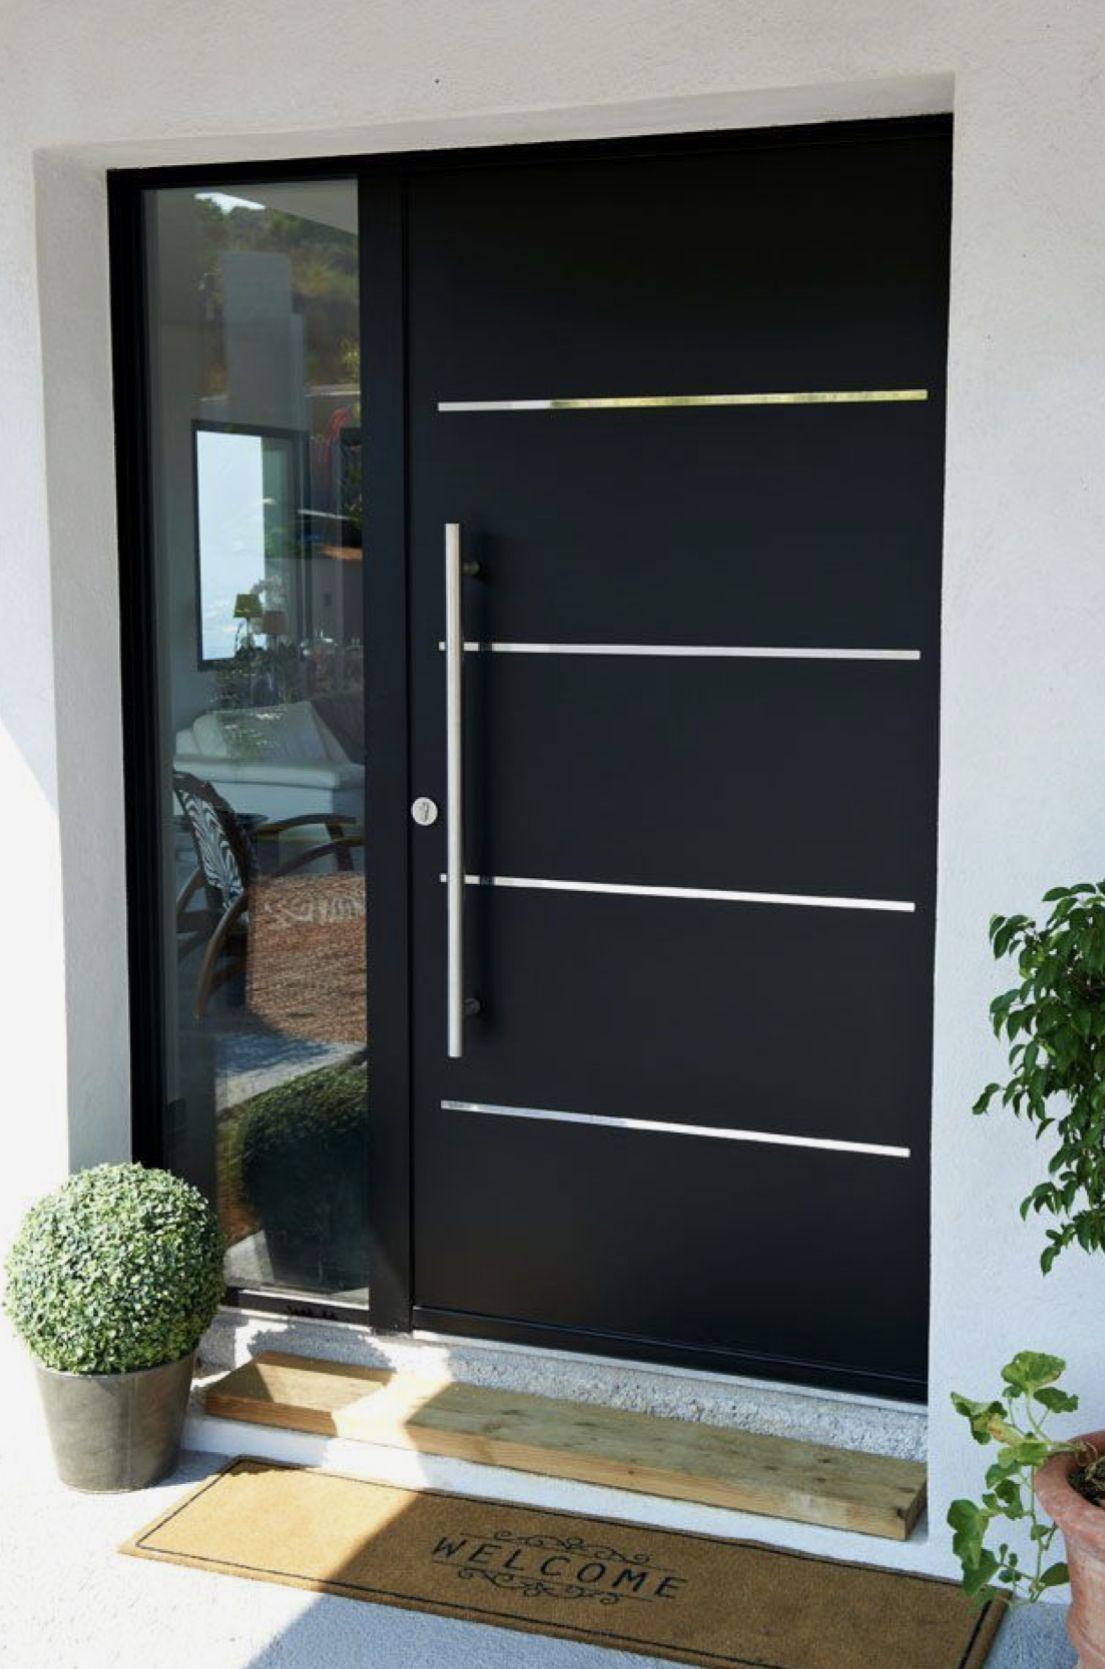 31+ Front door entrance ideas nz ideas